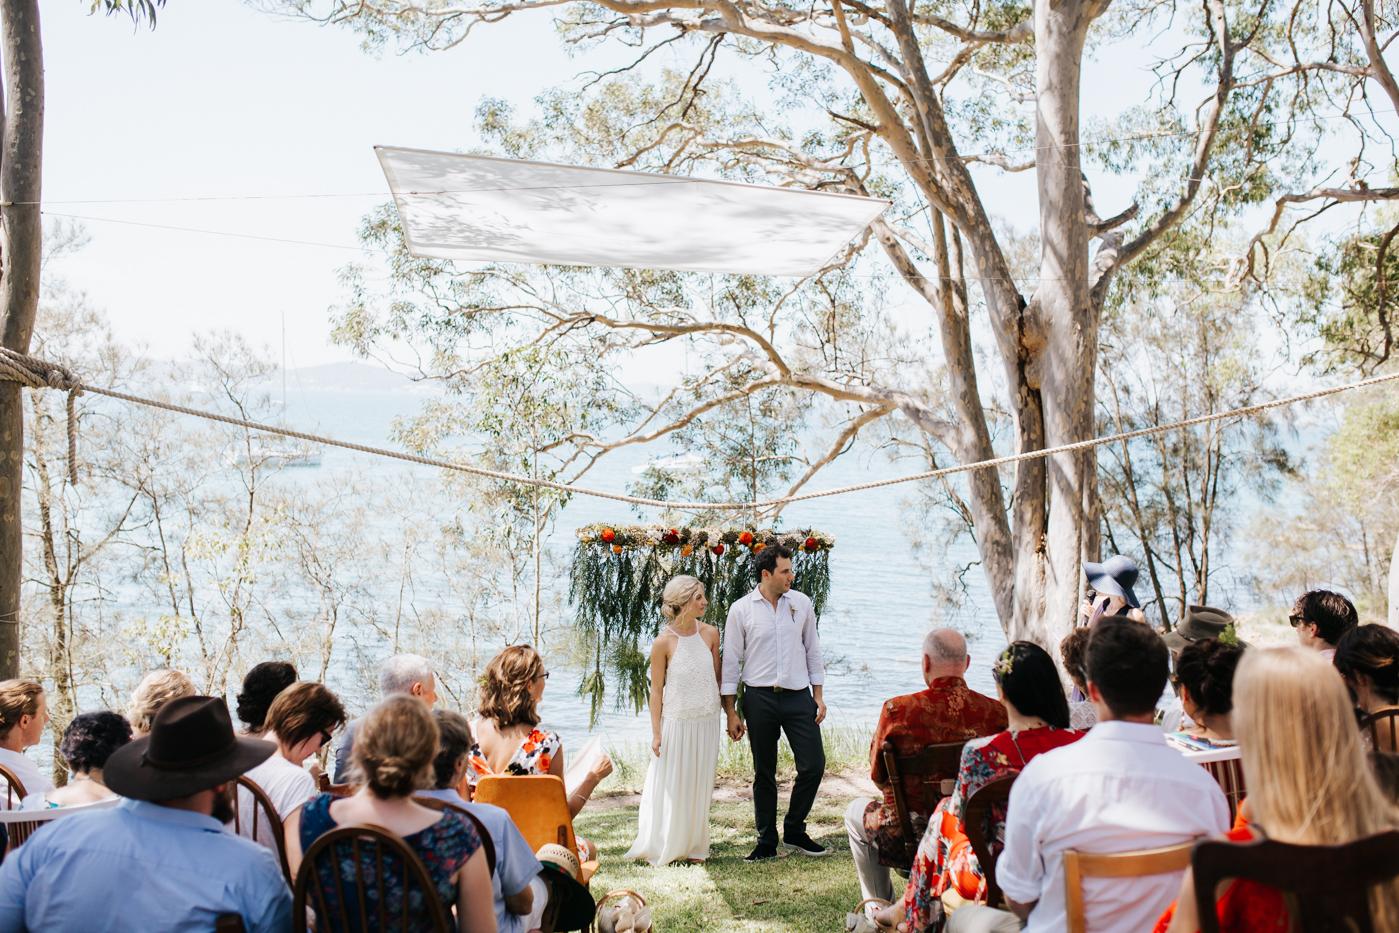 Emma & Ben - Lake Macquarie - Hunter Valley Wedding - Samantha Heather Photography-98.jpg